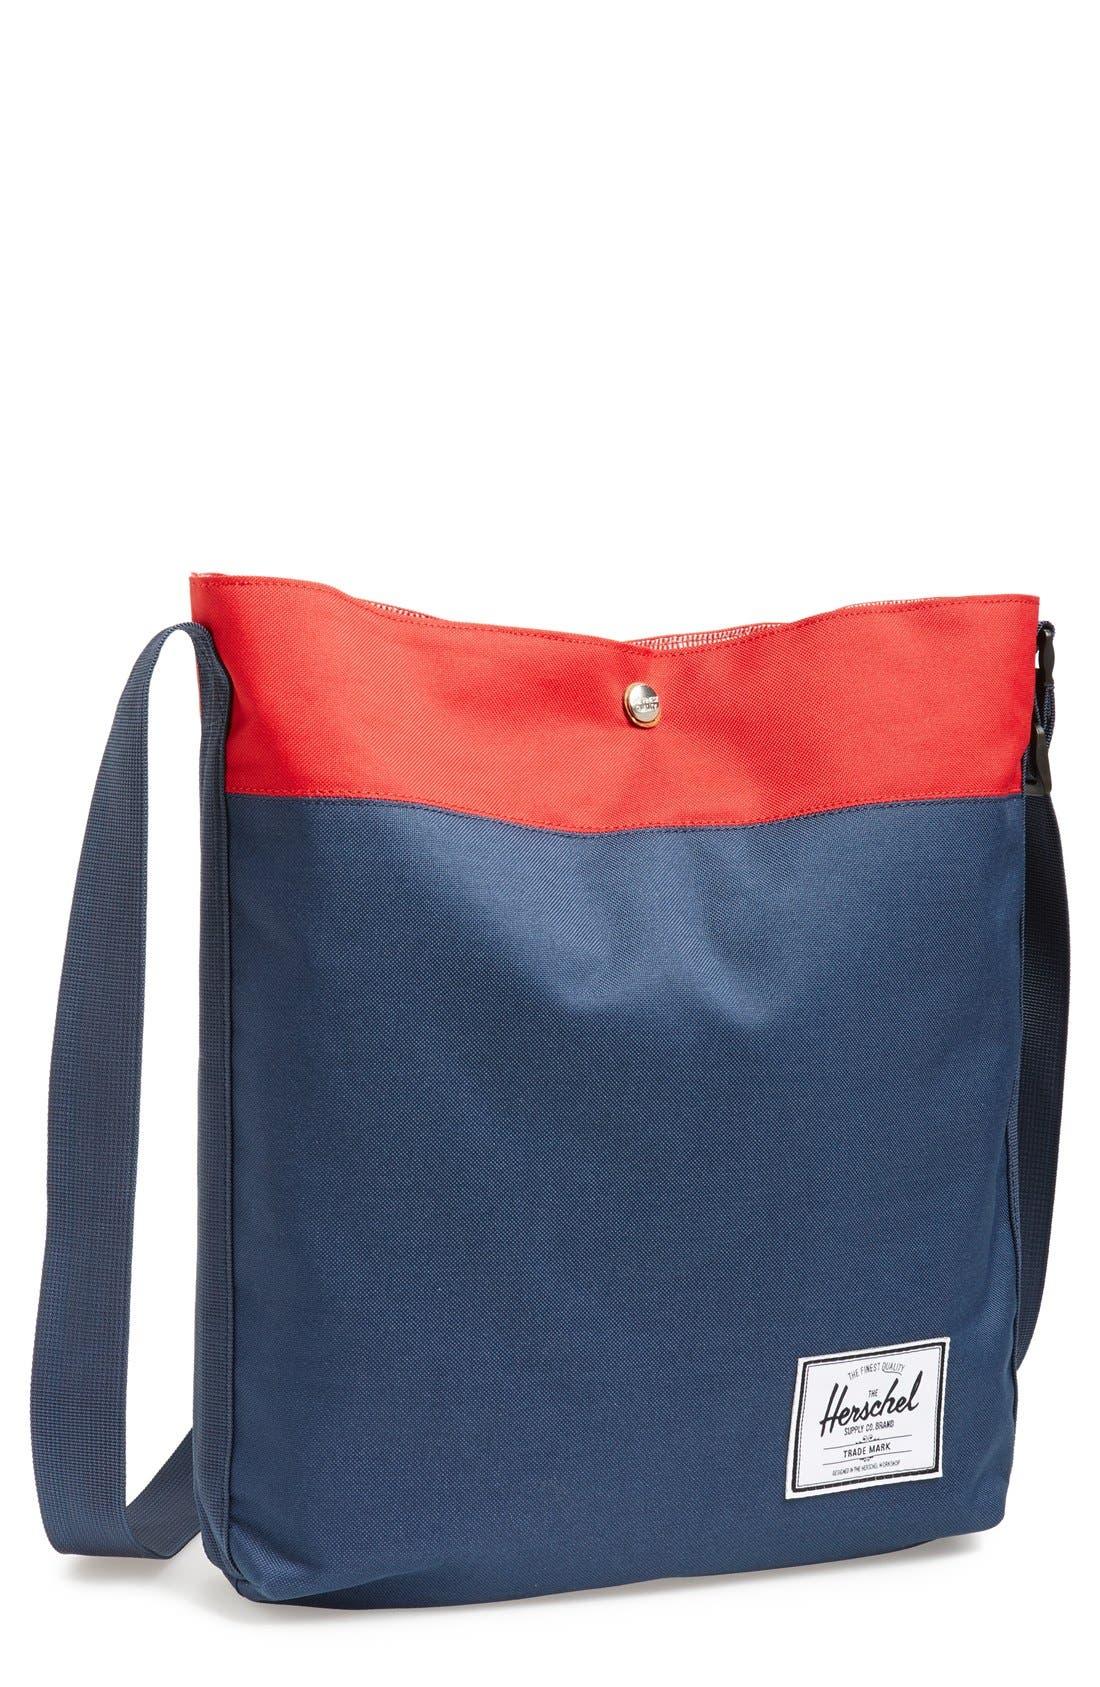 Alternate Image 1 Selected - Herschel Supply Co. 'Ottawa' Tote Bag